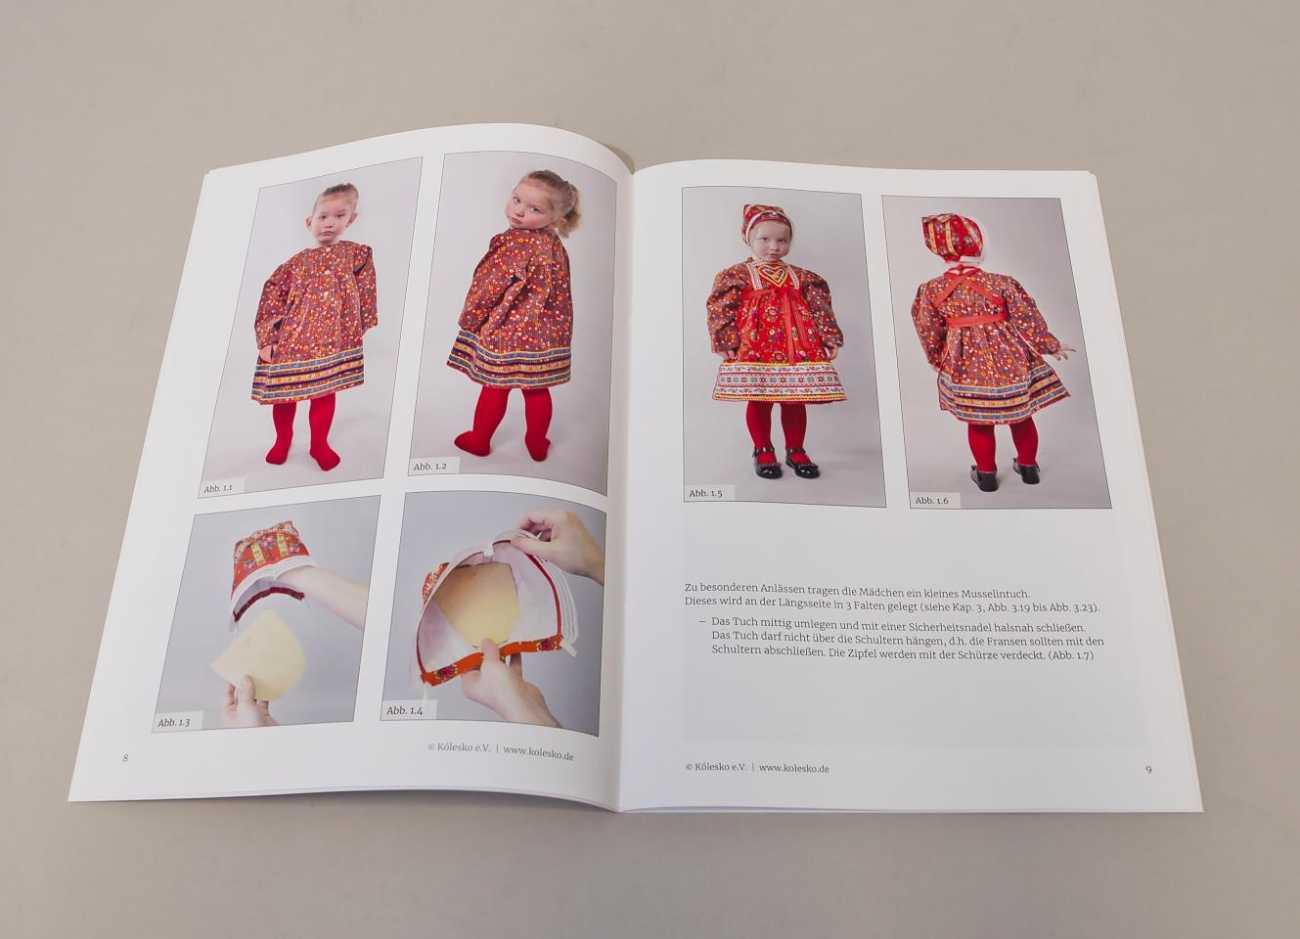 Gładźarnica - Die Schleifer Kindertracht